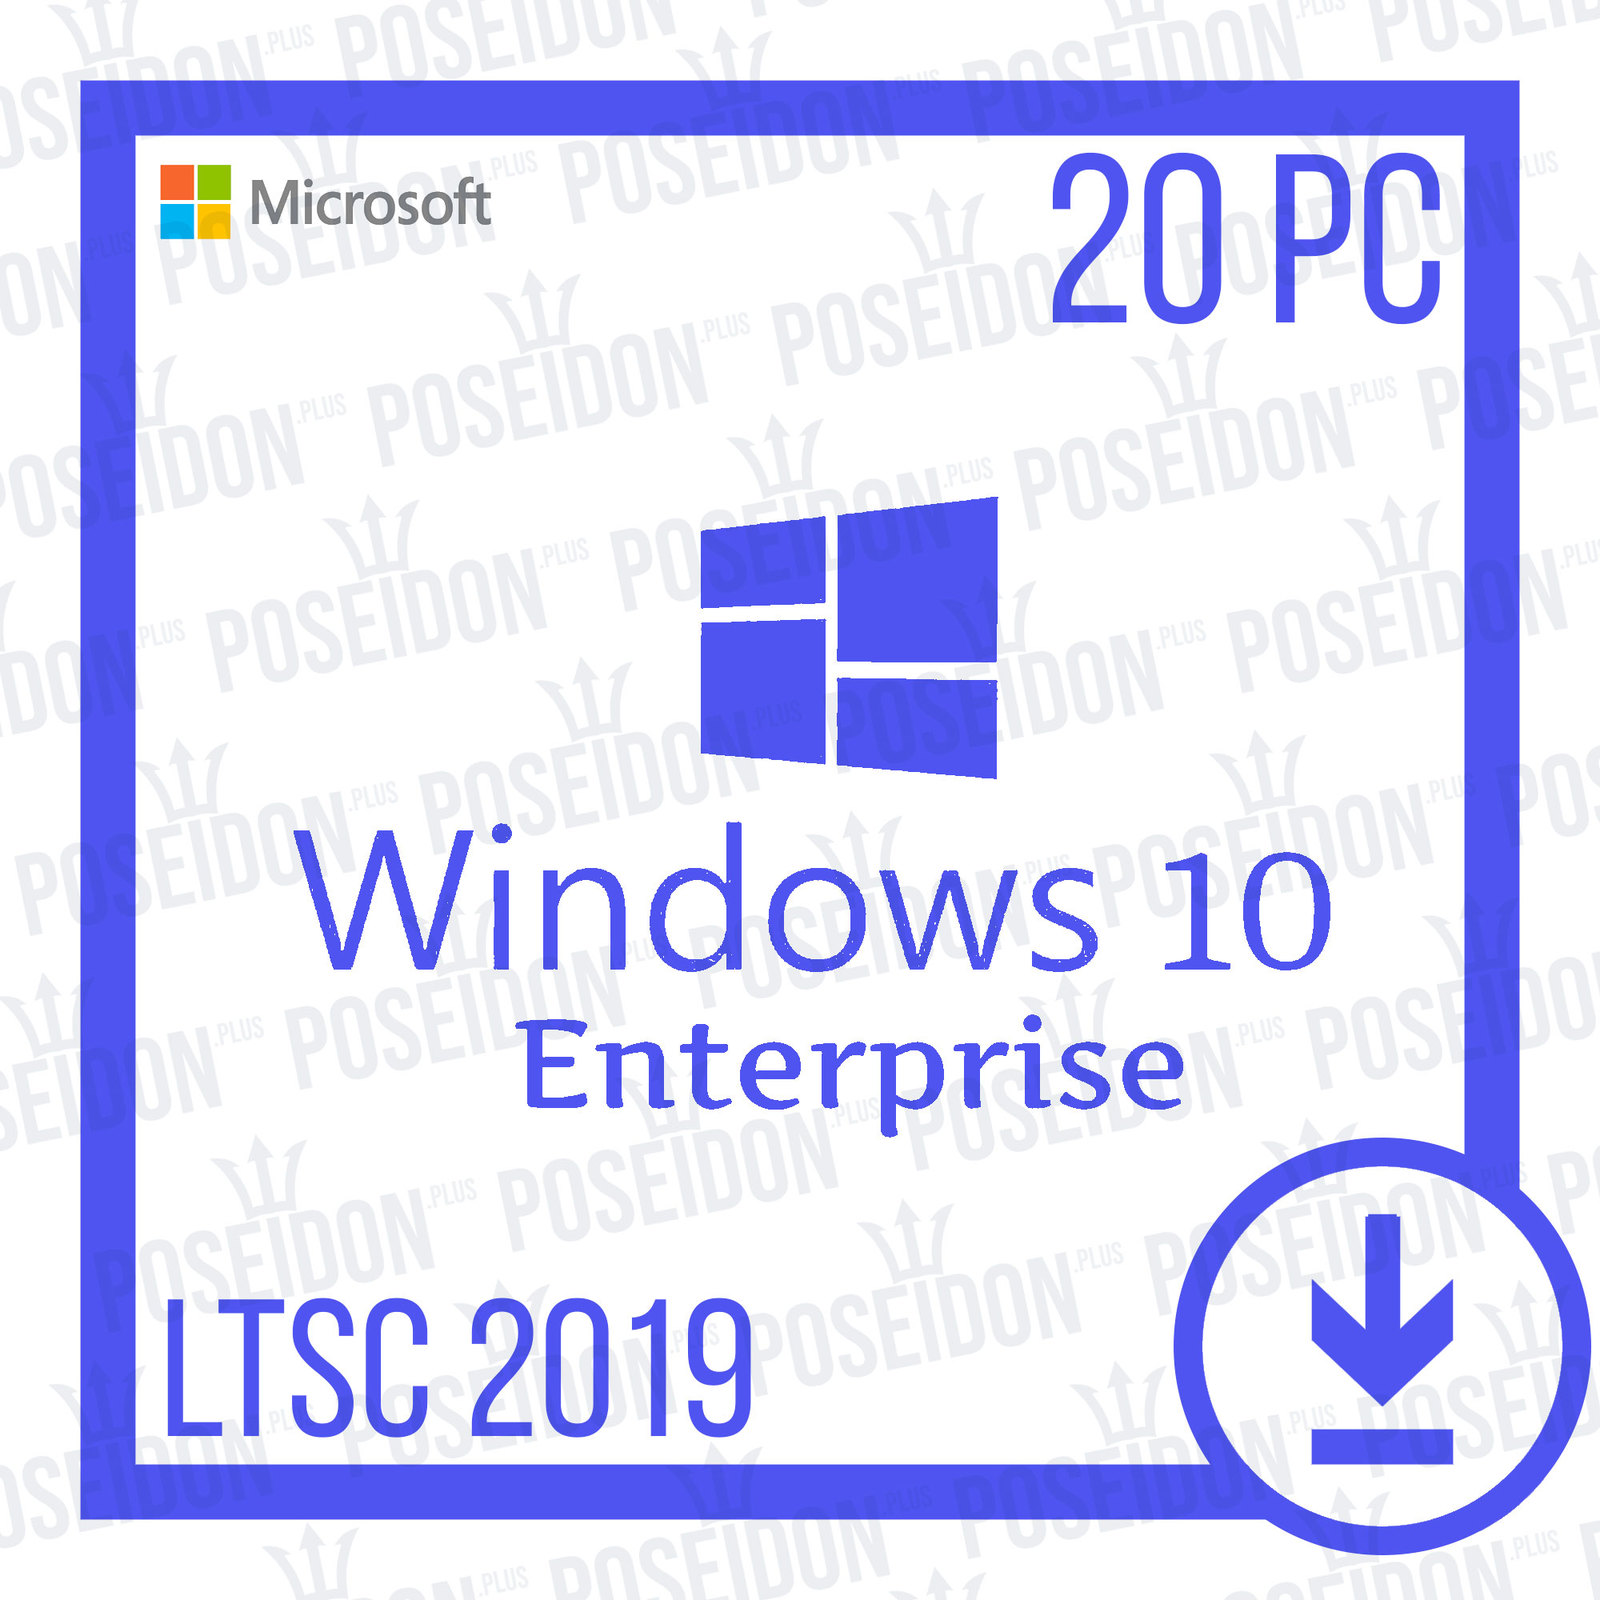 Windows 10 Enterprise LTSC 2019 20 PC and 50 similar items